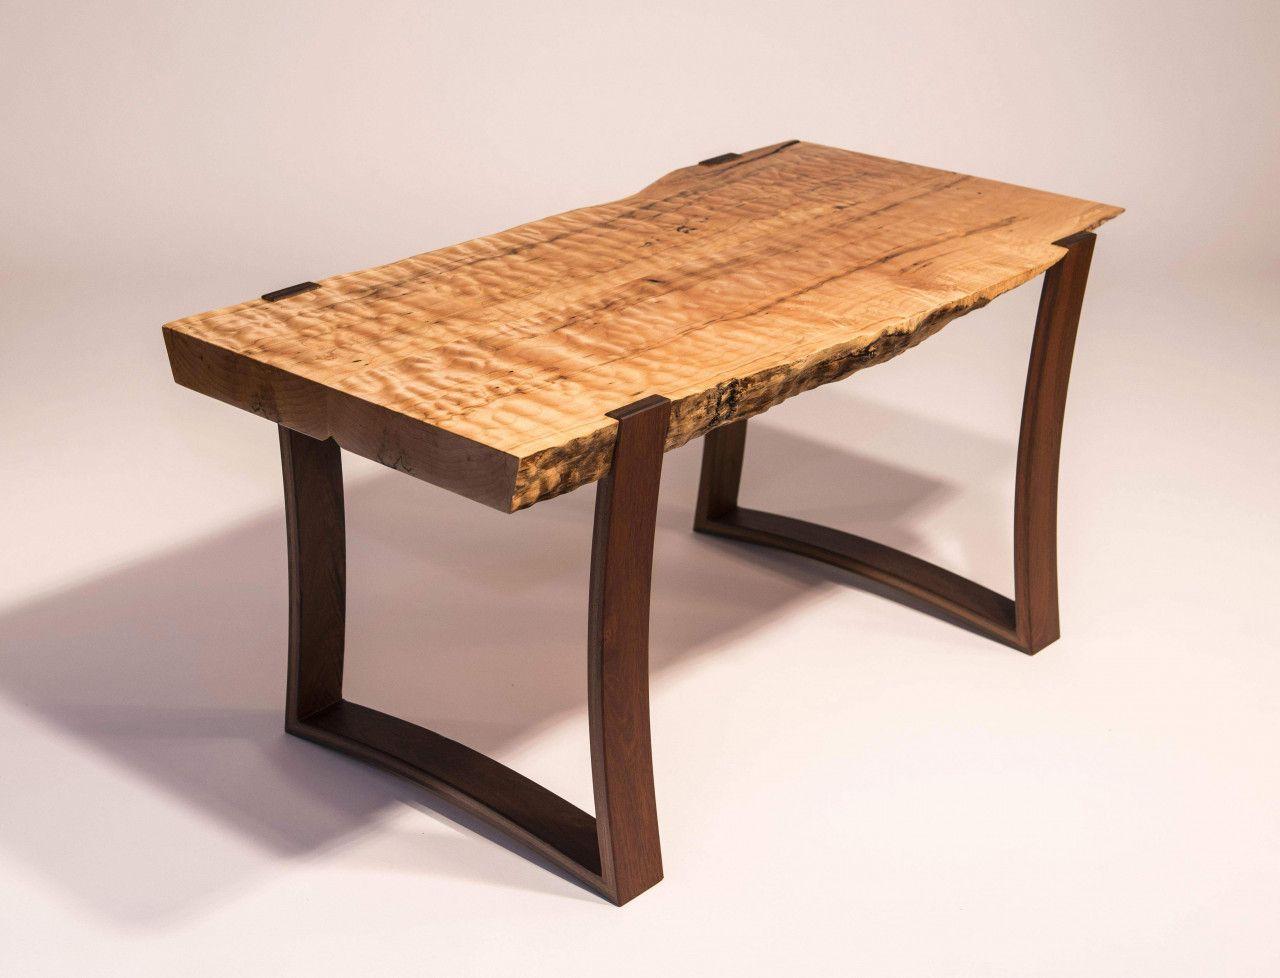 20 Beautiful Unfinished Wood Coffee Table Legs 2019 Desk